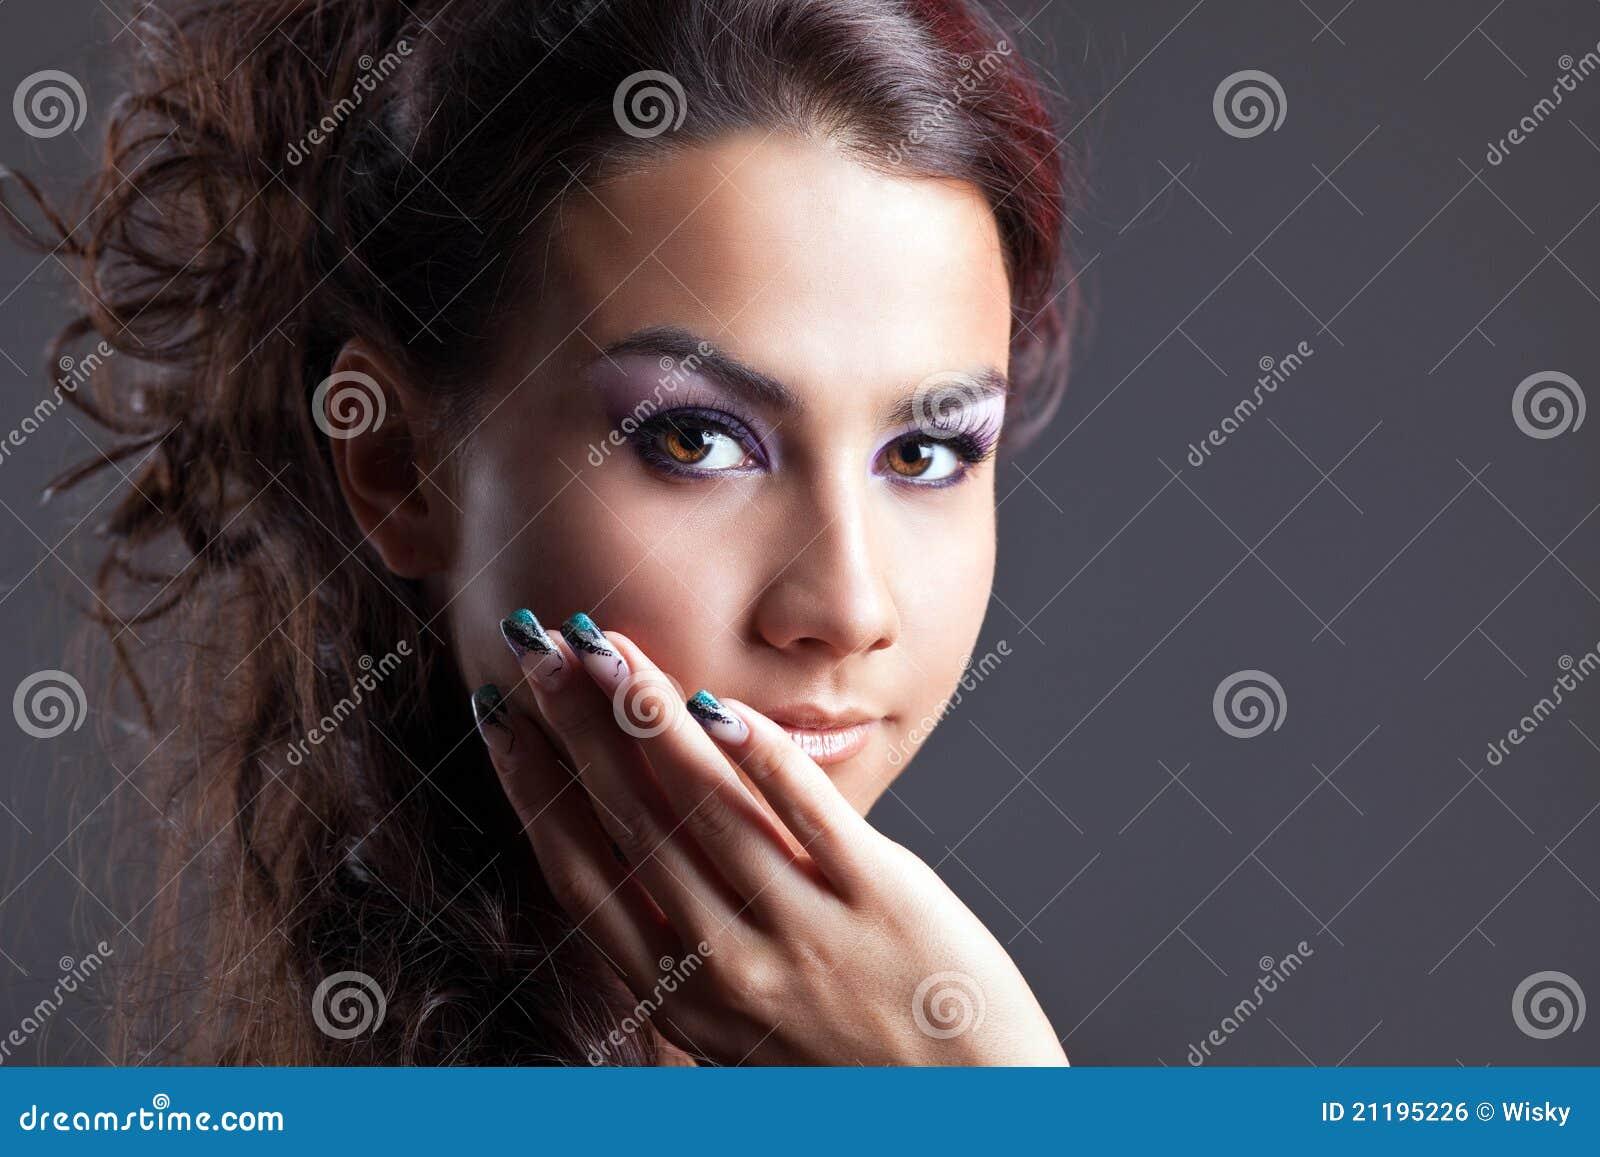 Attractive young brunette woman portrait